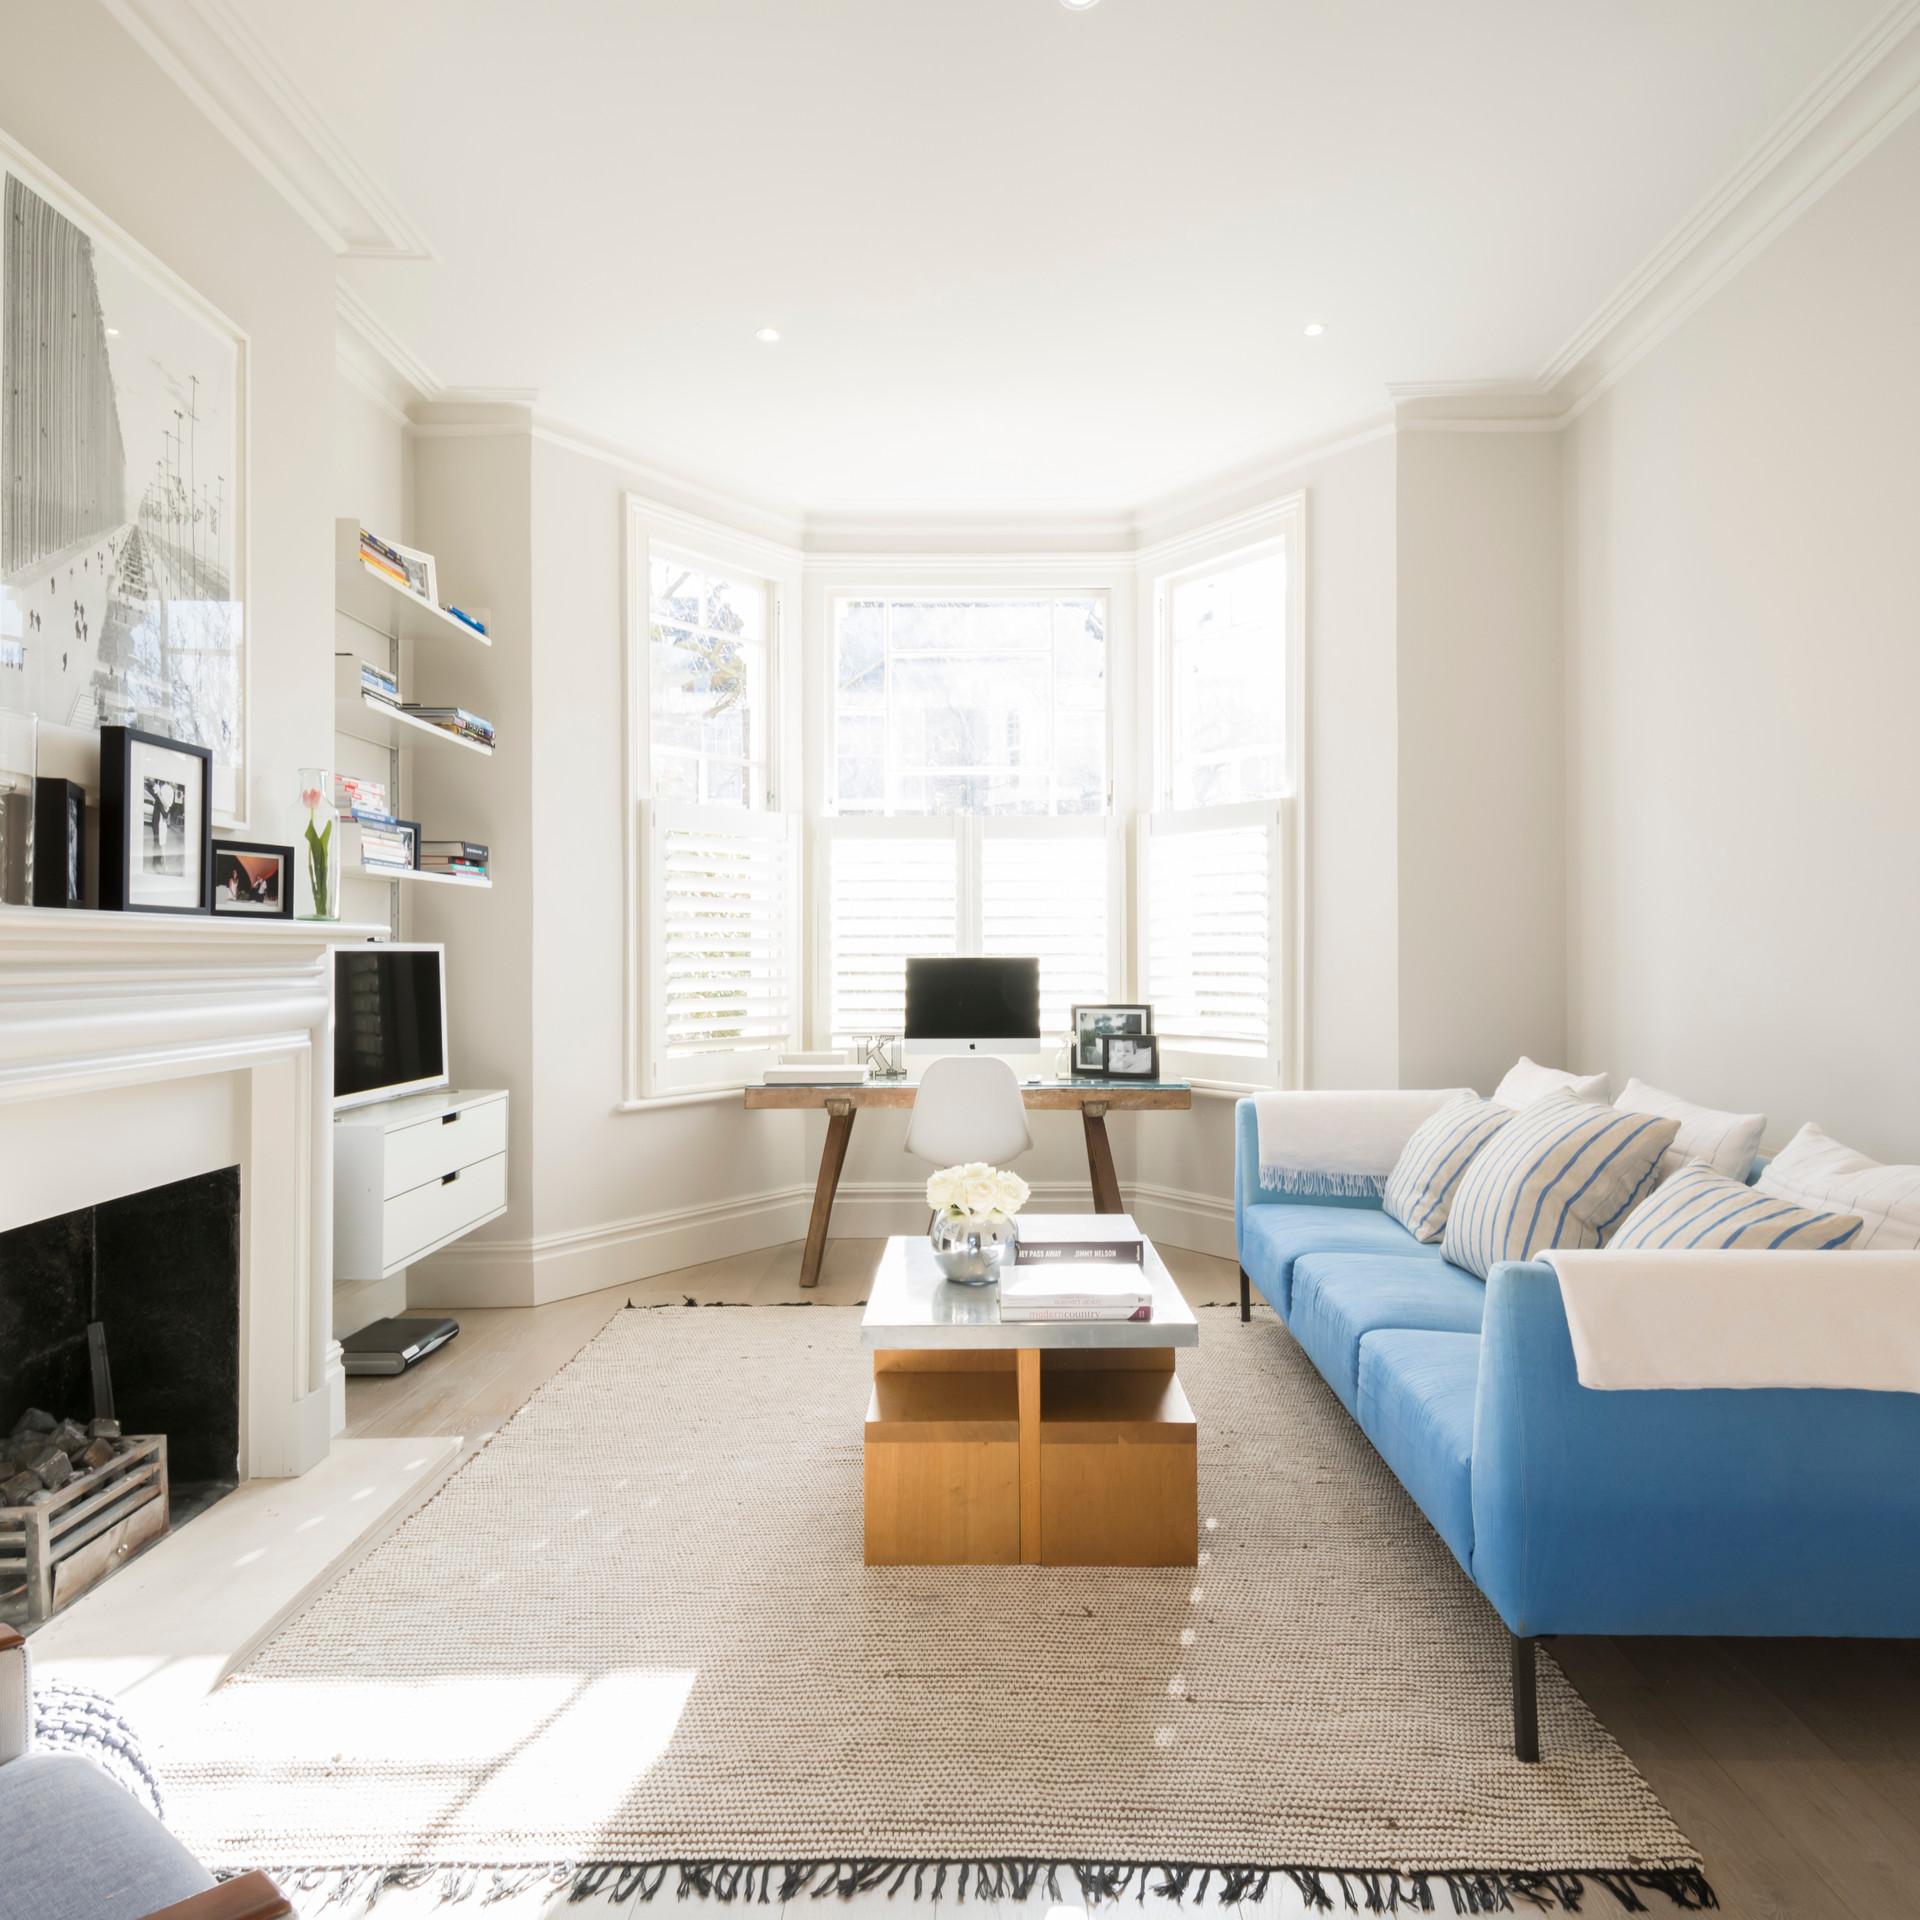 Sitting room with blue sofa.jpg